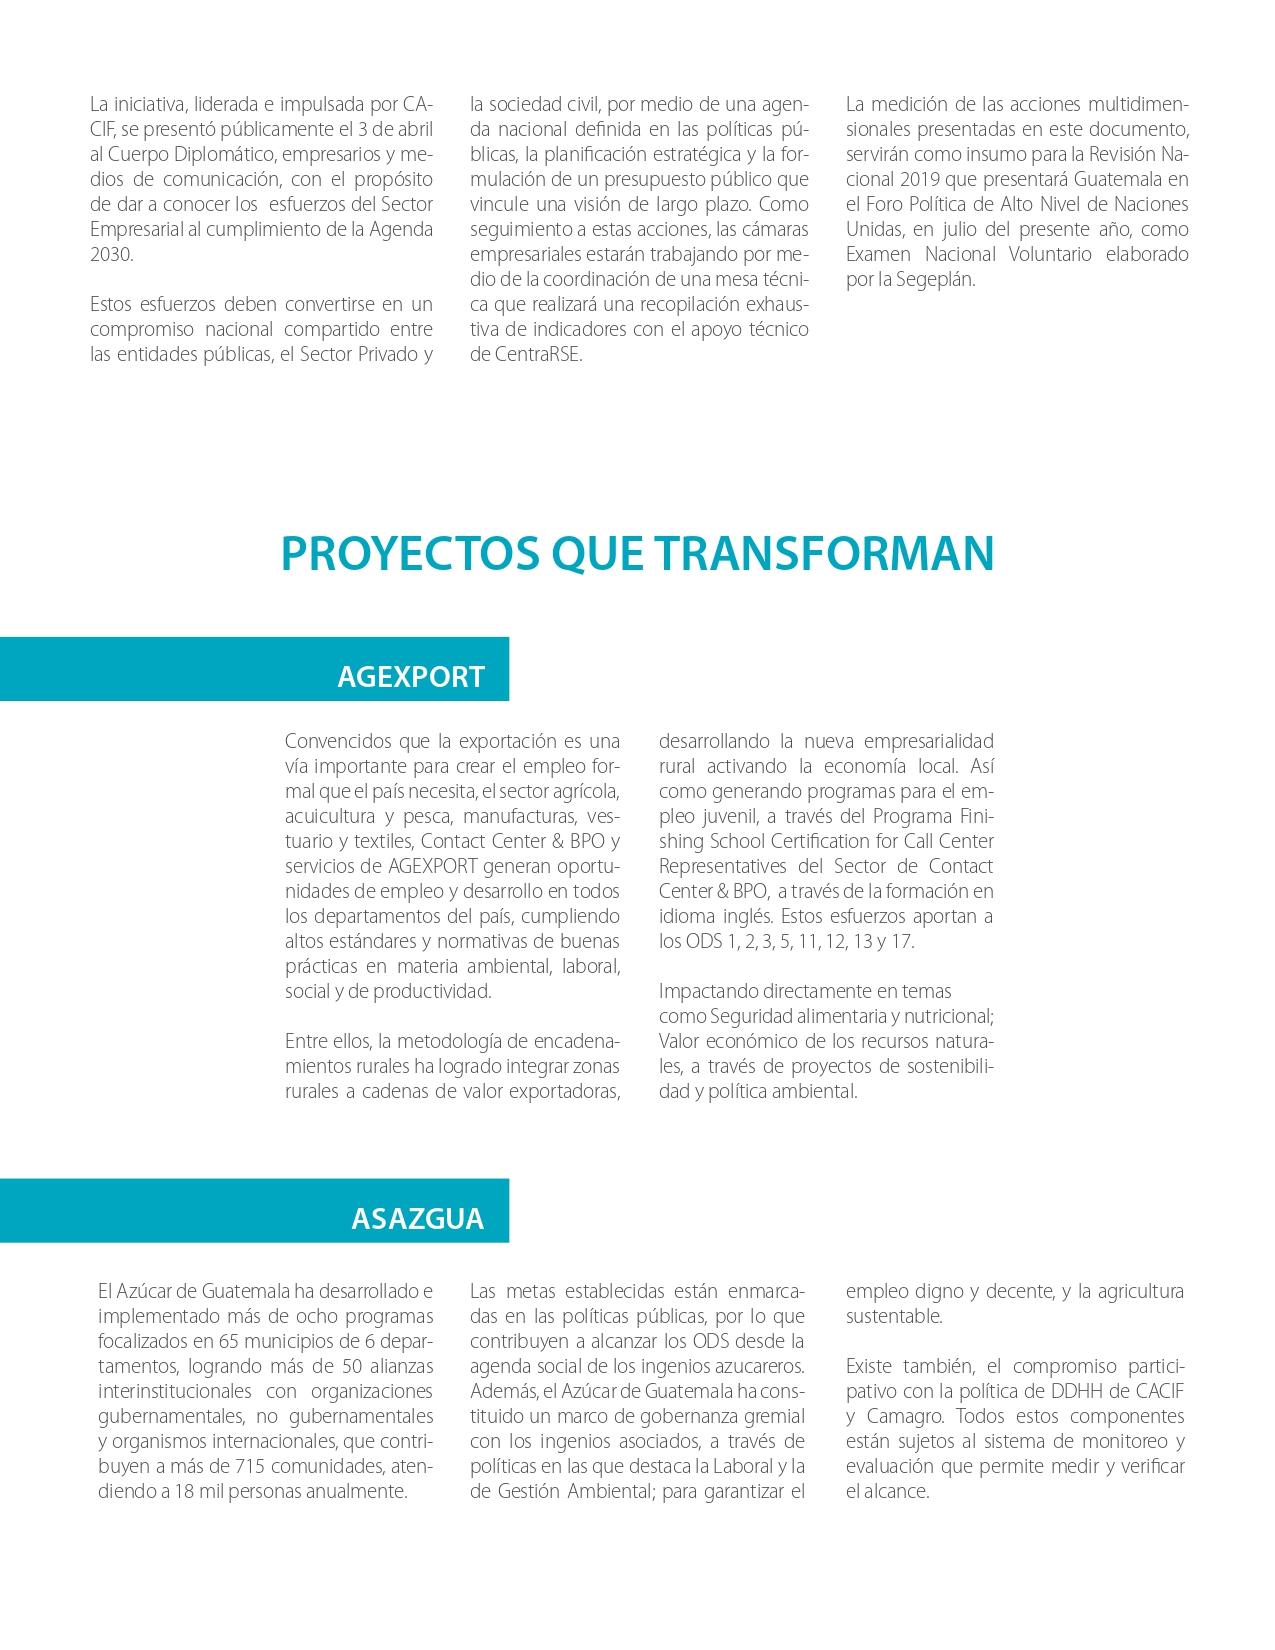 RESUMEN EJECUTIVO-2 (1)_page-0002.jpg